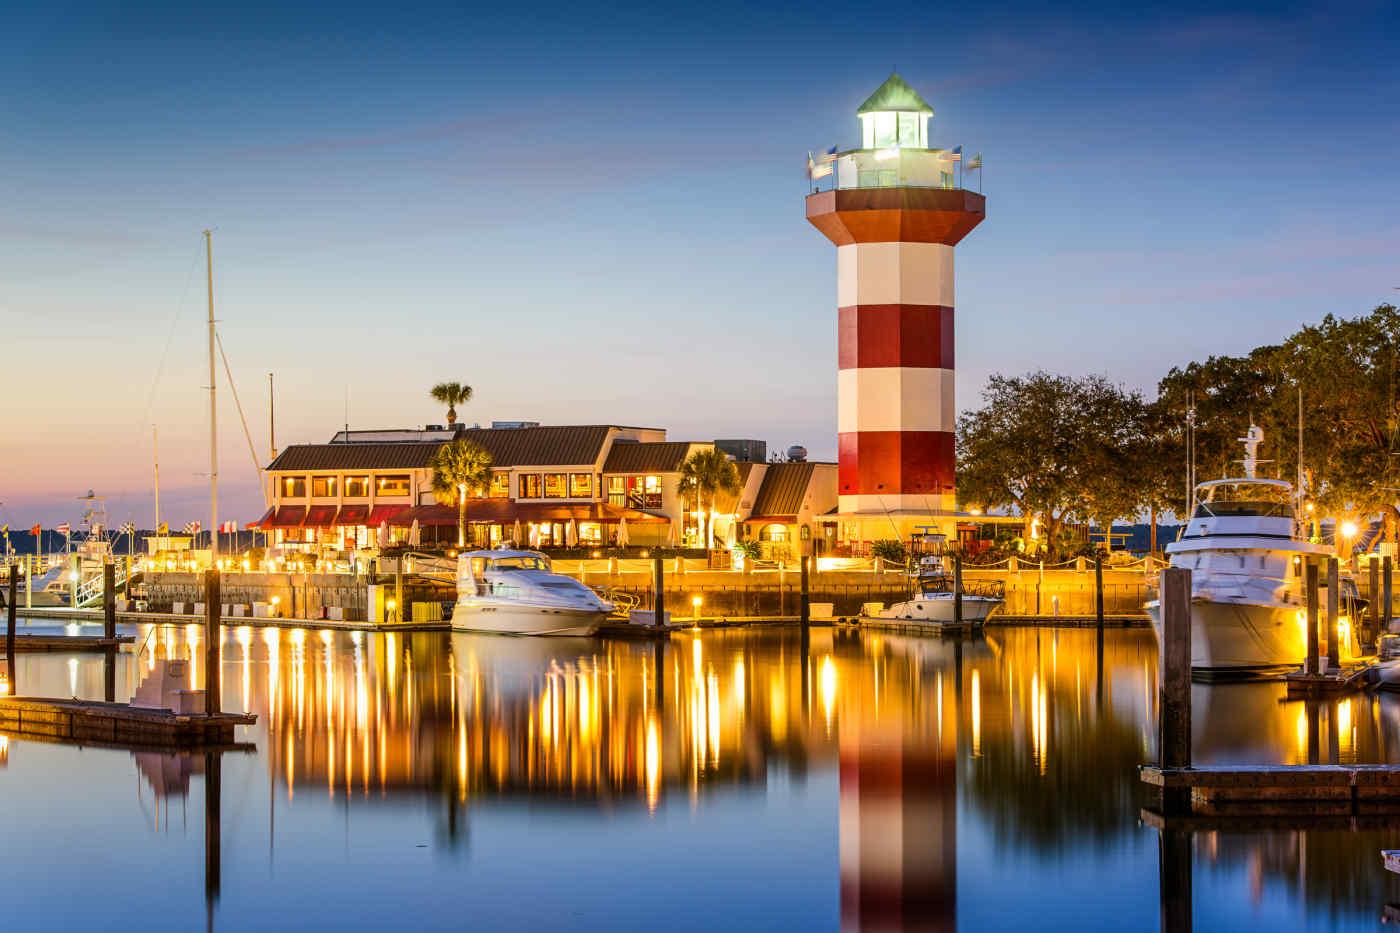 Harbour Town Lighthouse, Hilton Head Island, South Carolina